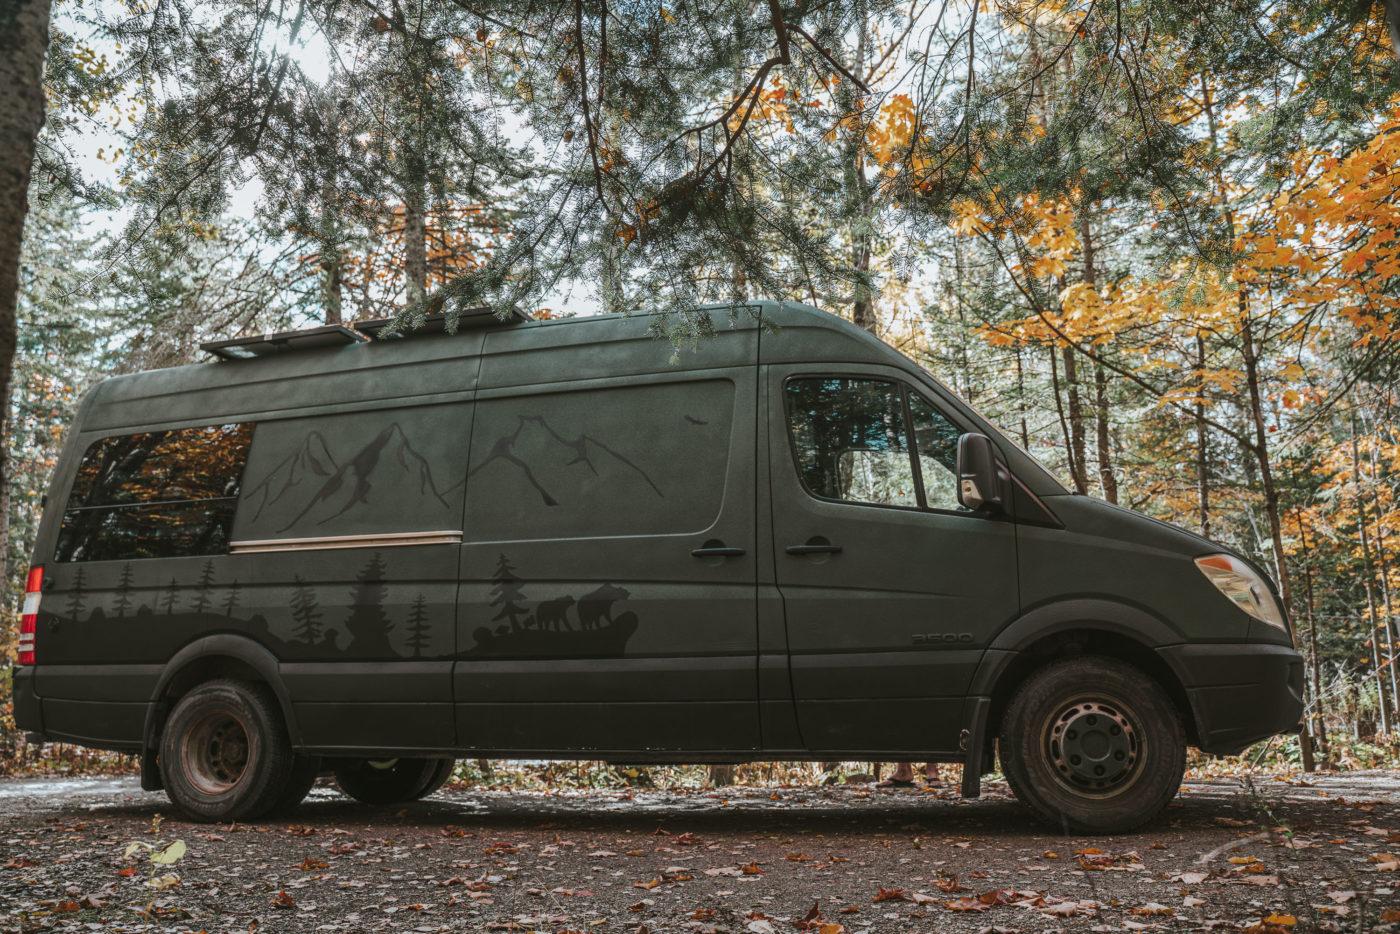 Canada Ontario Bruce Peninsula National Park van-06872